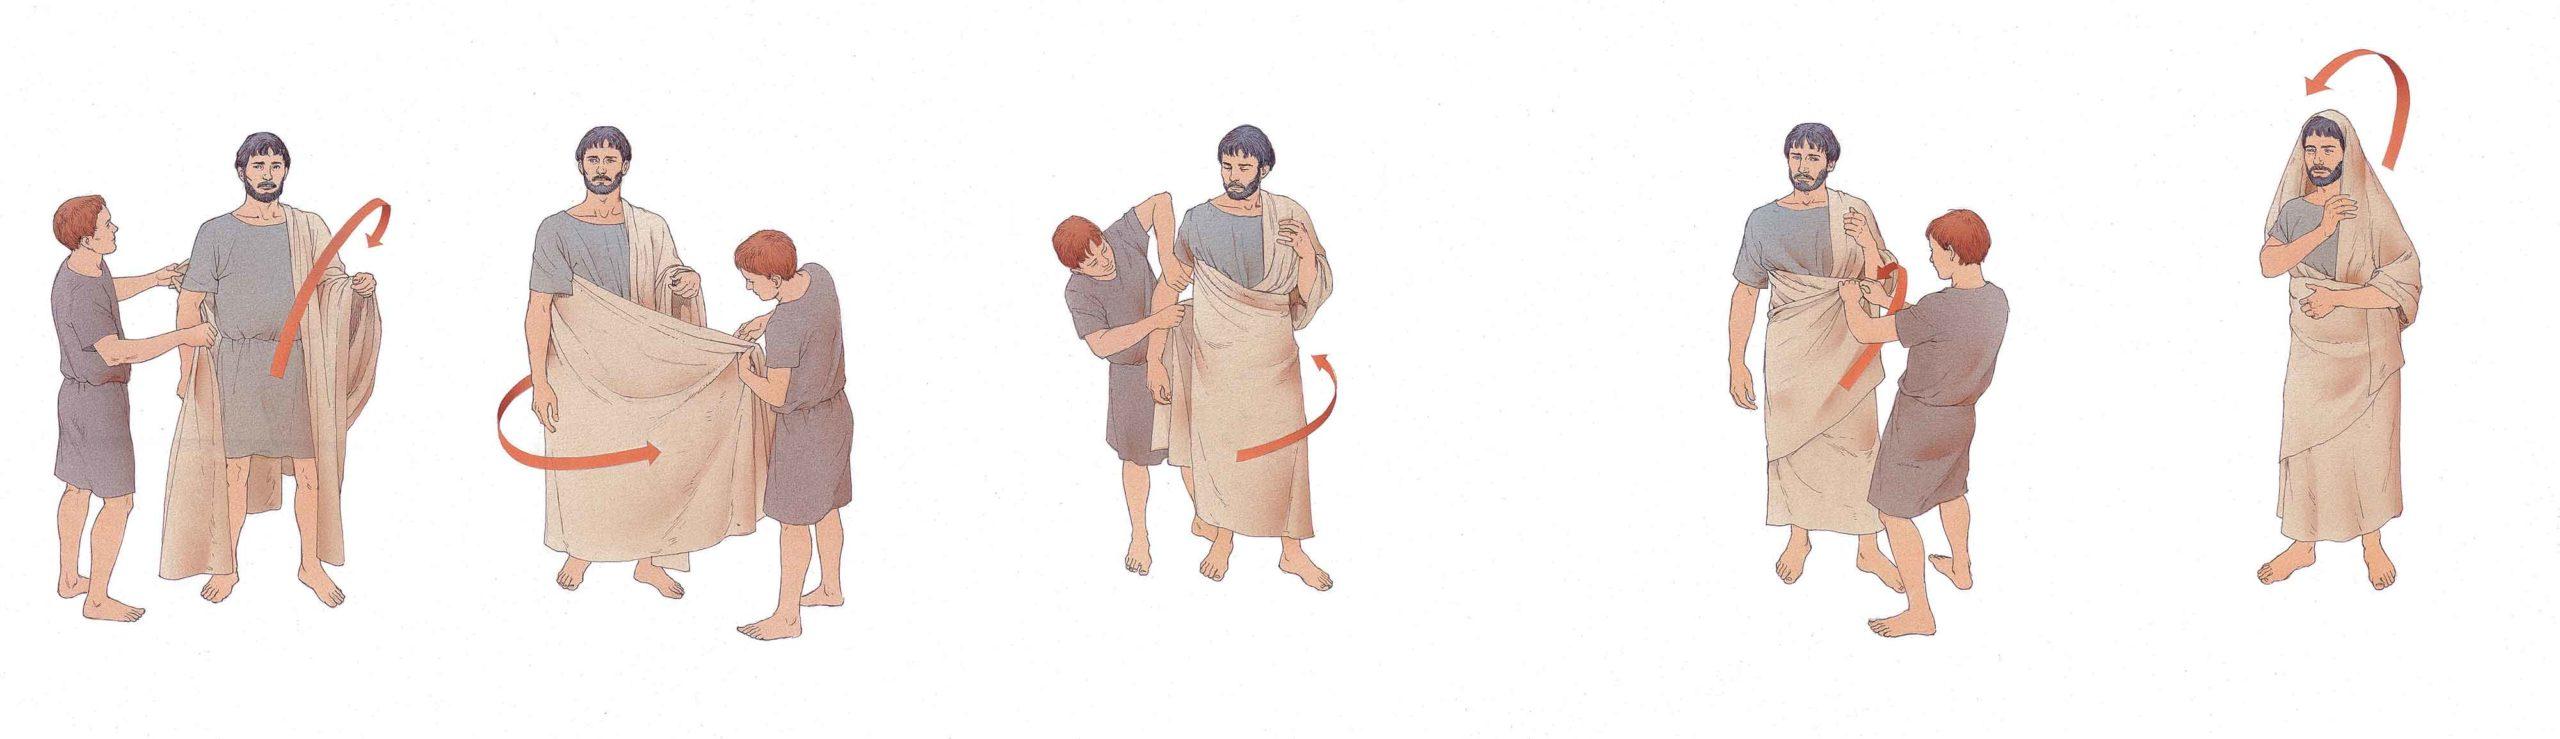 Romolo-indossail-cinto-gabino-inklink-musei-simone-boni